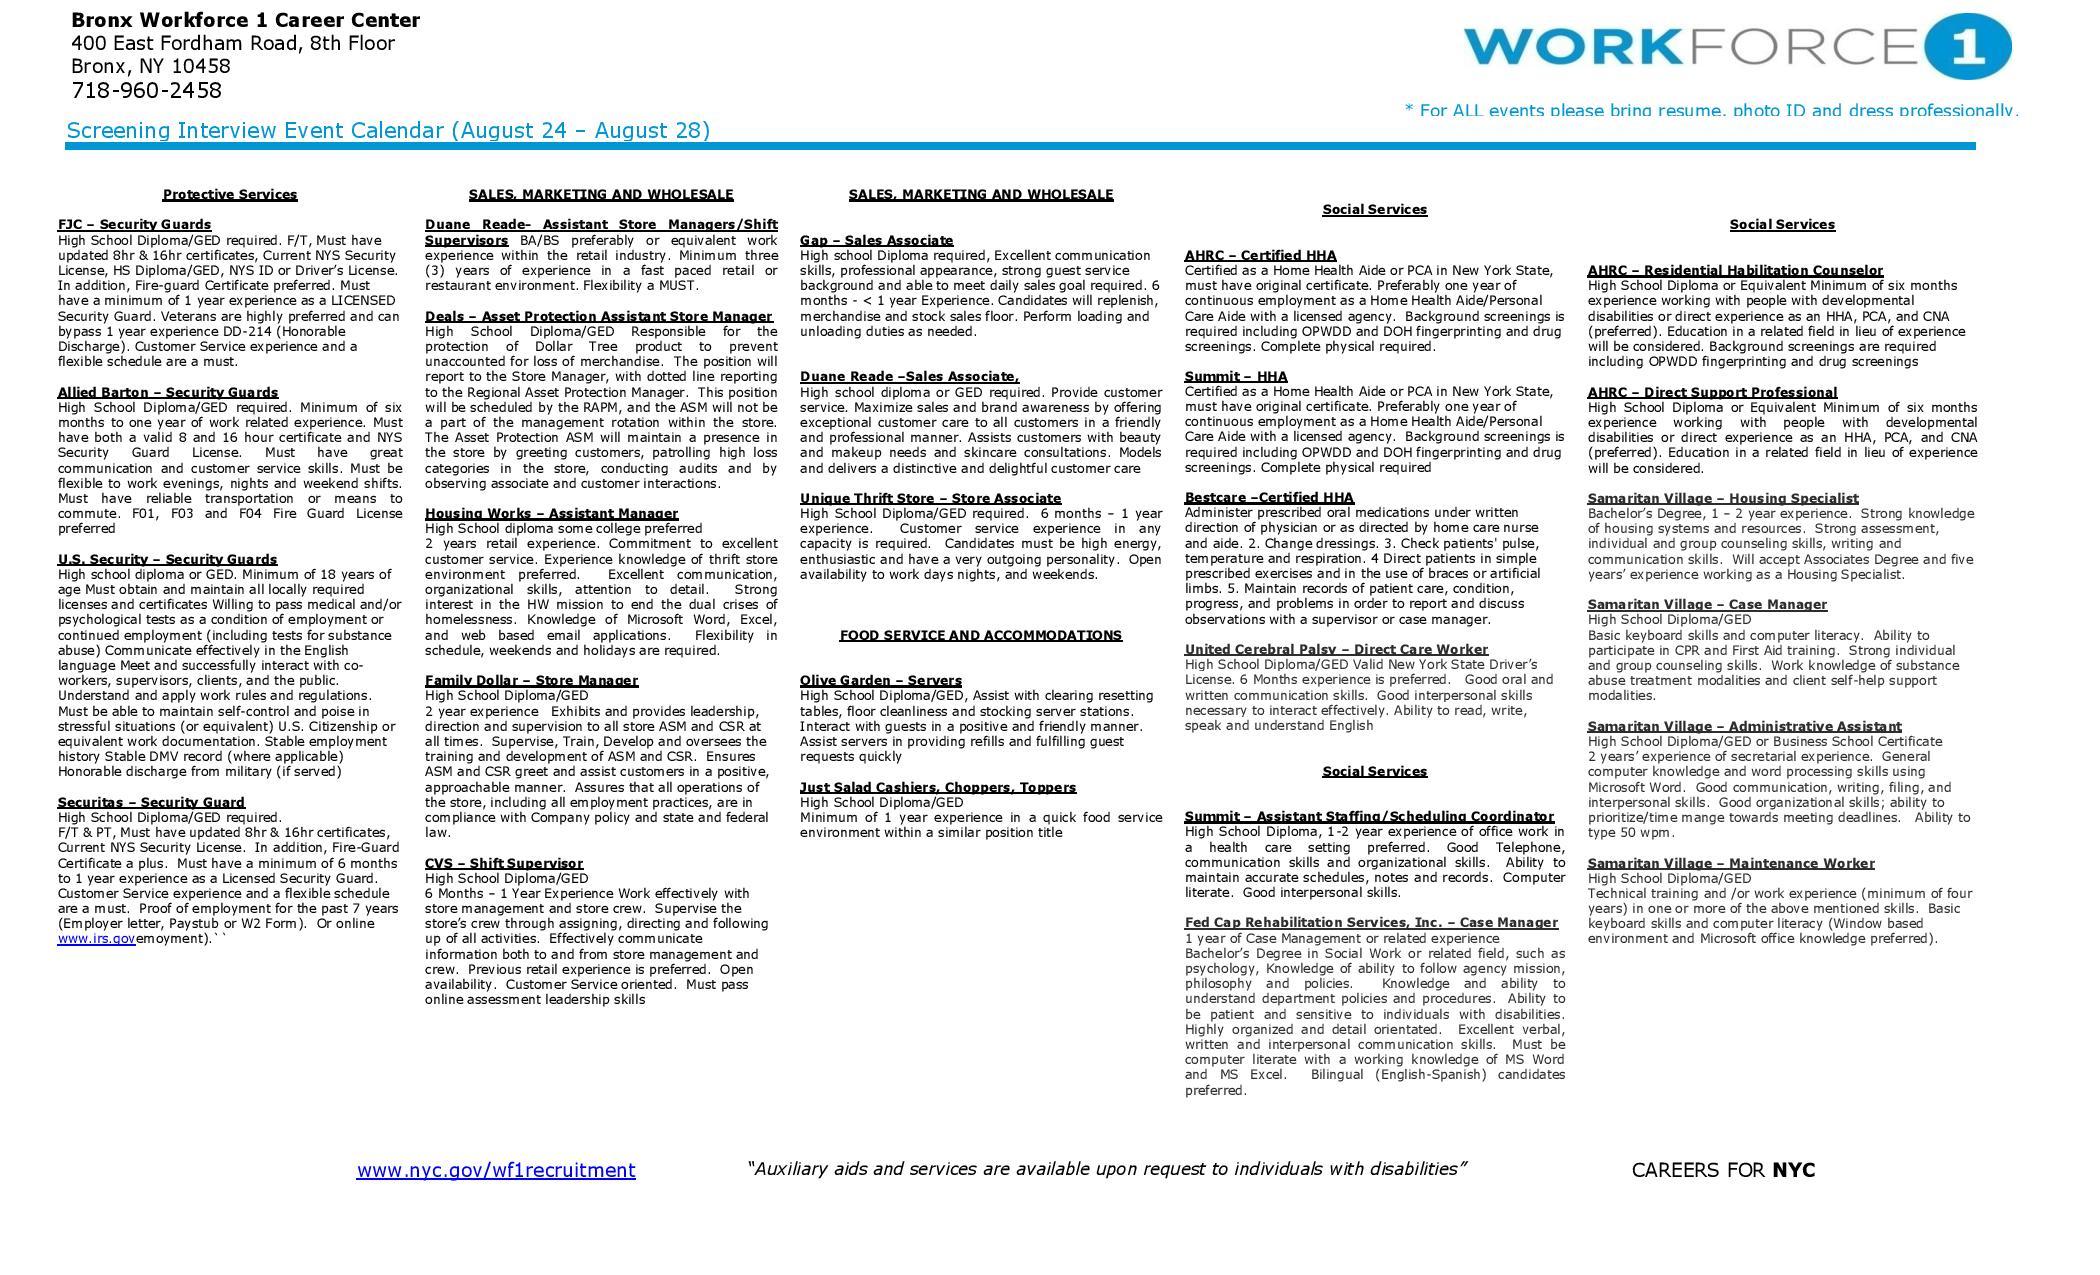 Employment new york city council member fernando cabrera page 4 bronx workforce 1 recruitment calendar 824 828 1betcityfo Image collections